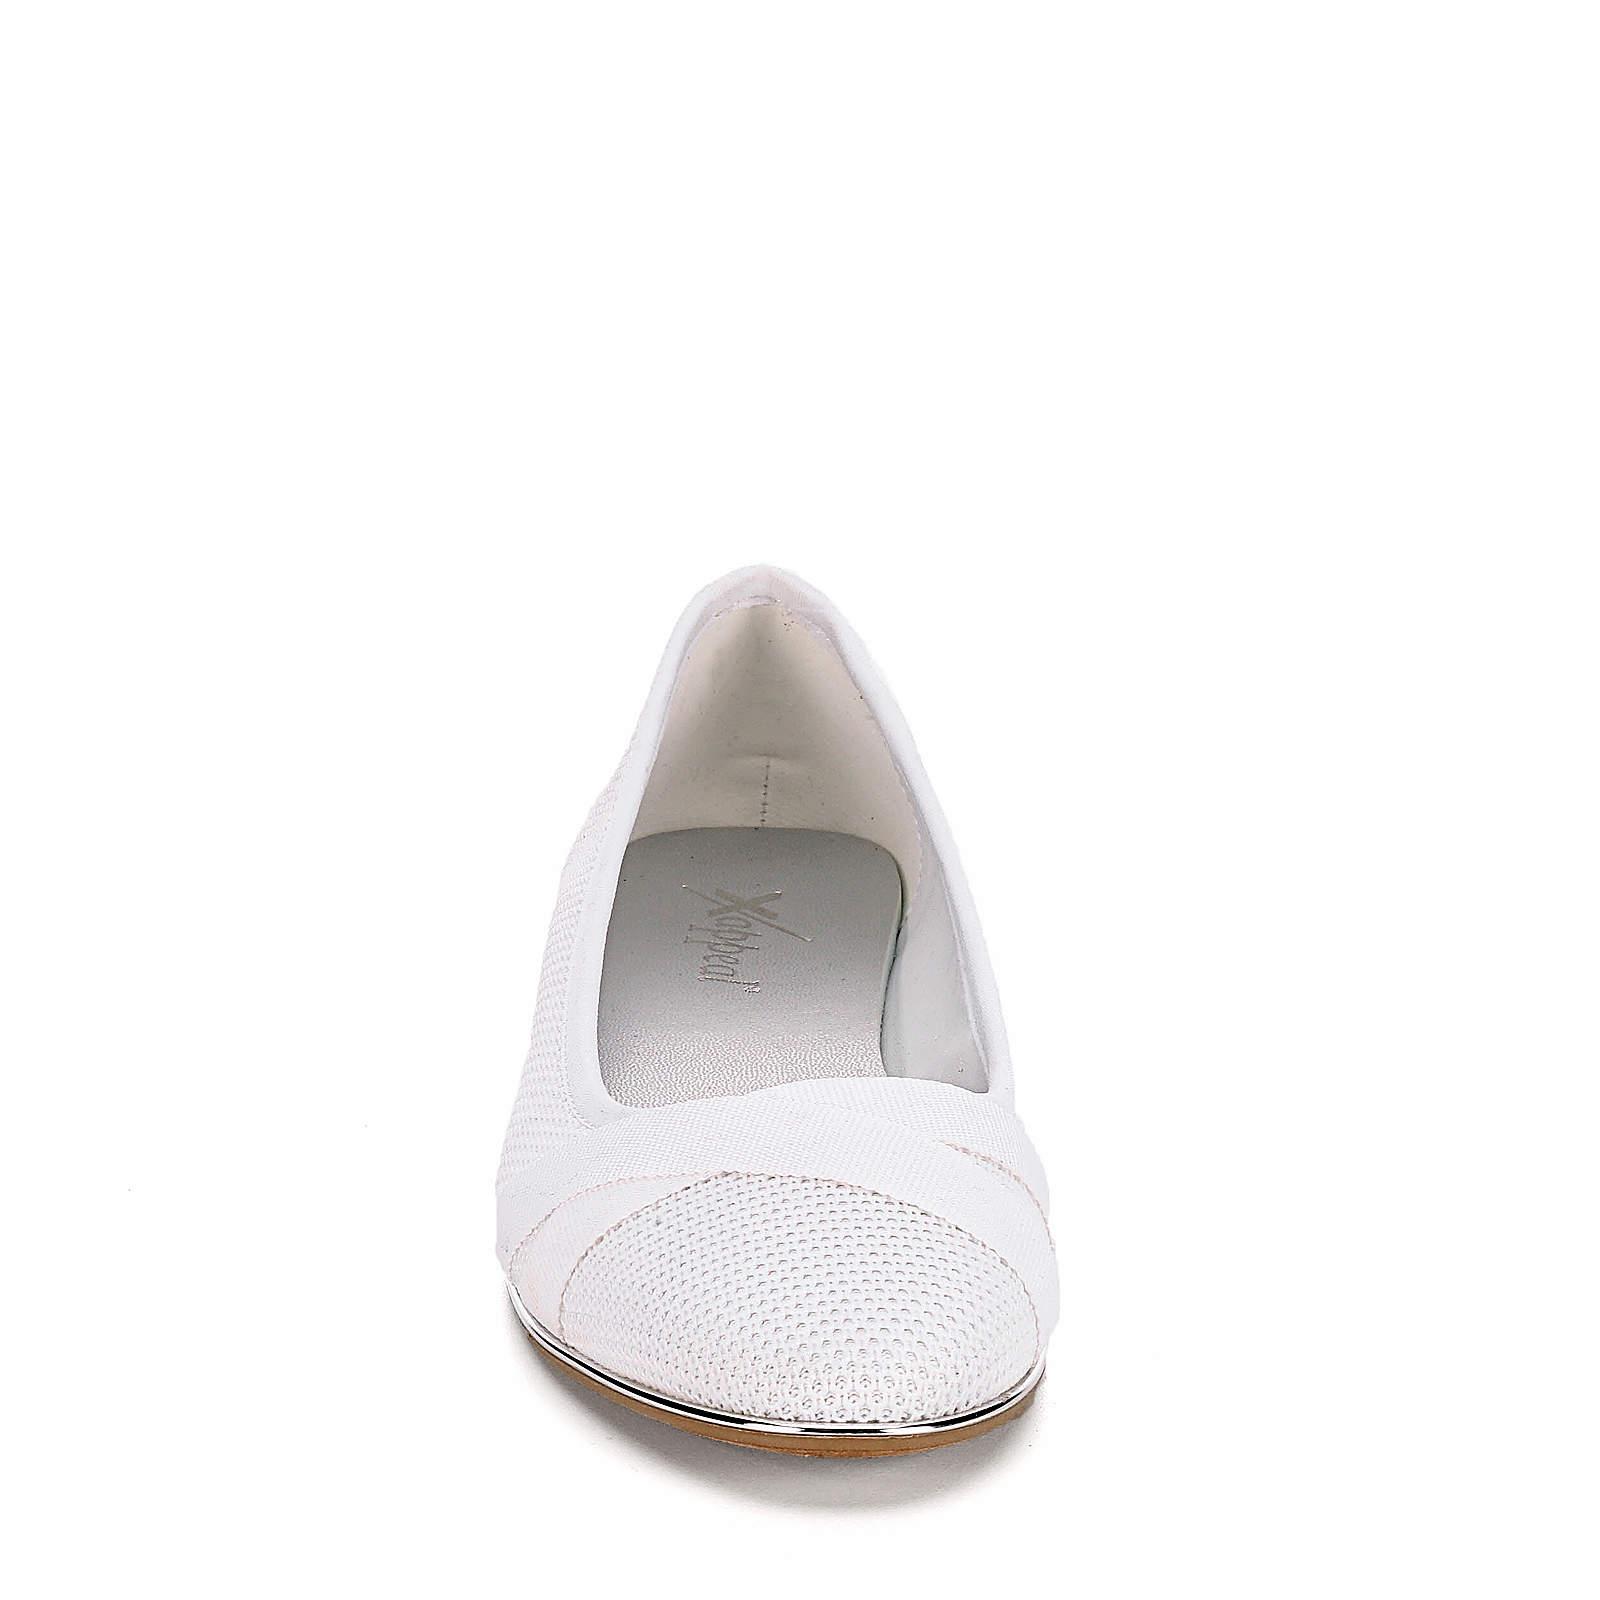 XAPPEAL-Womens-Mitzie-Slip-On-Mesh-Flat-Shoes thumbnail 11